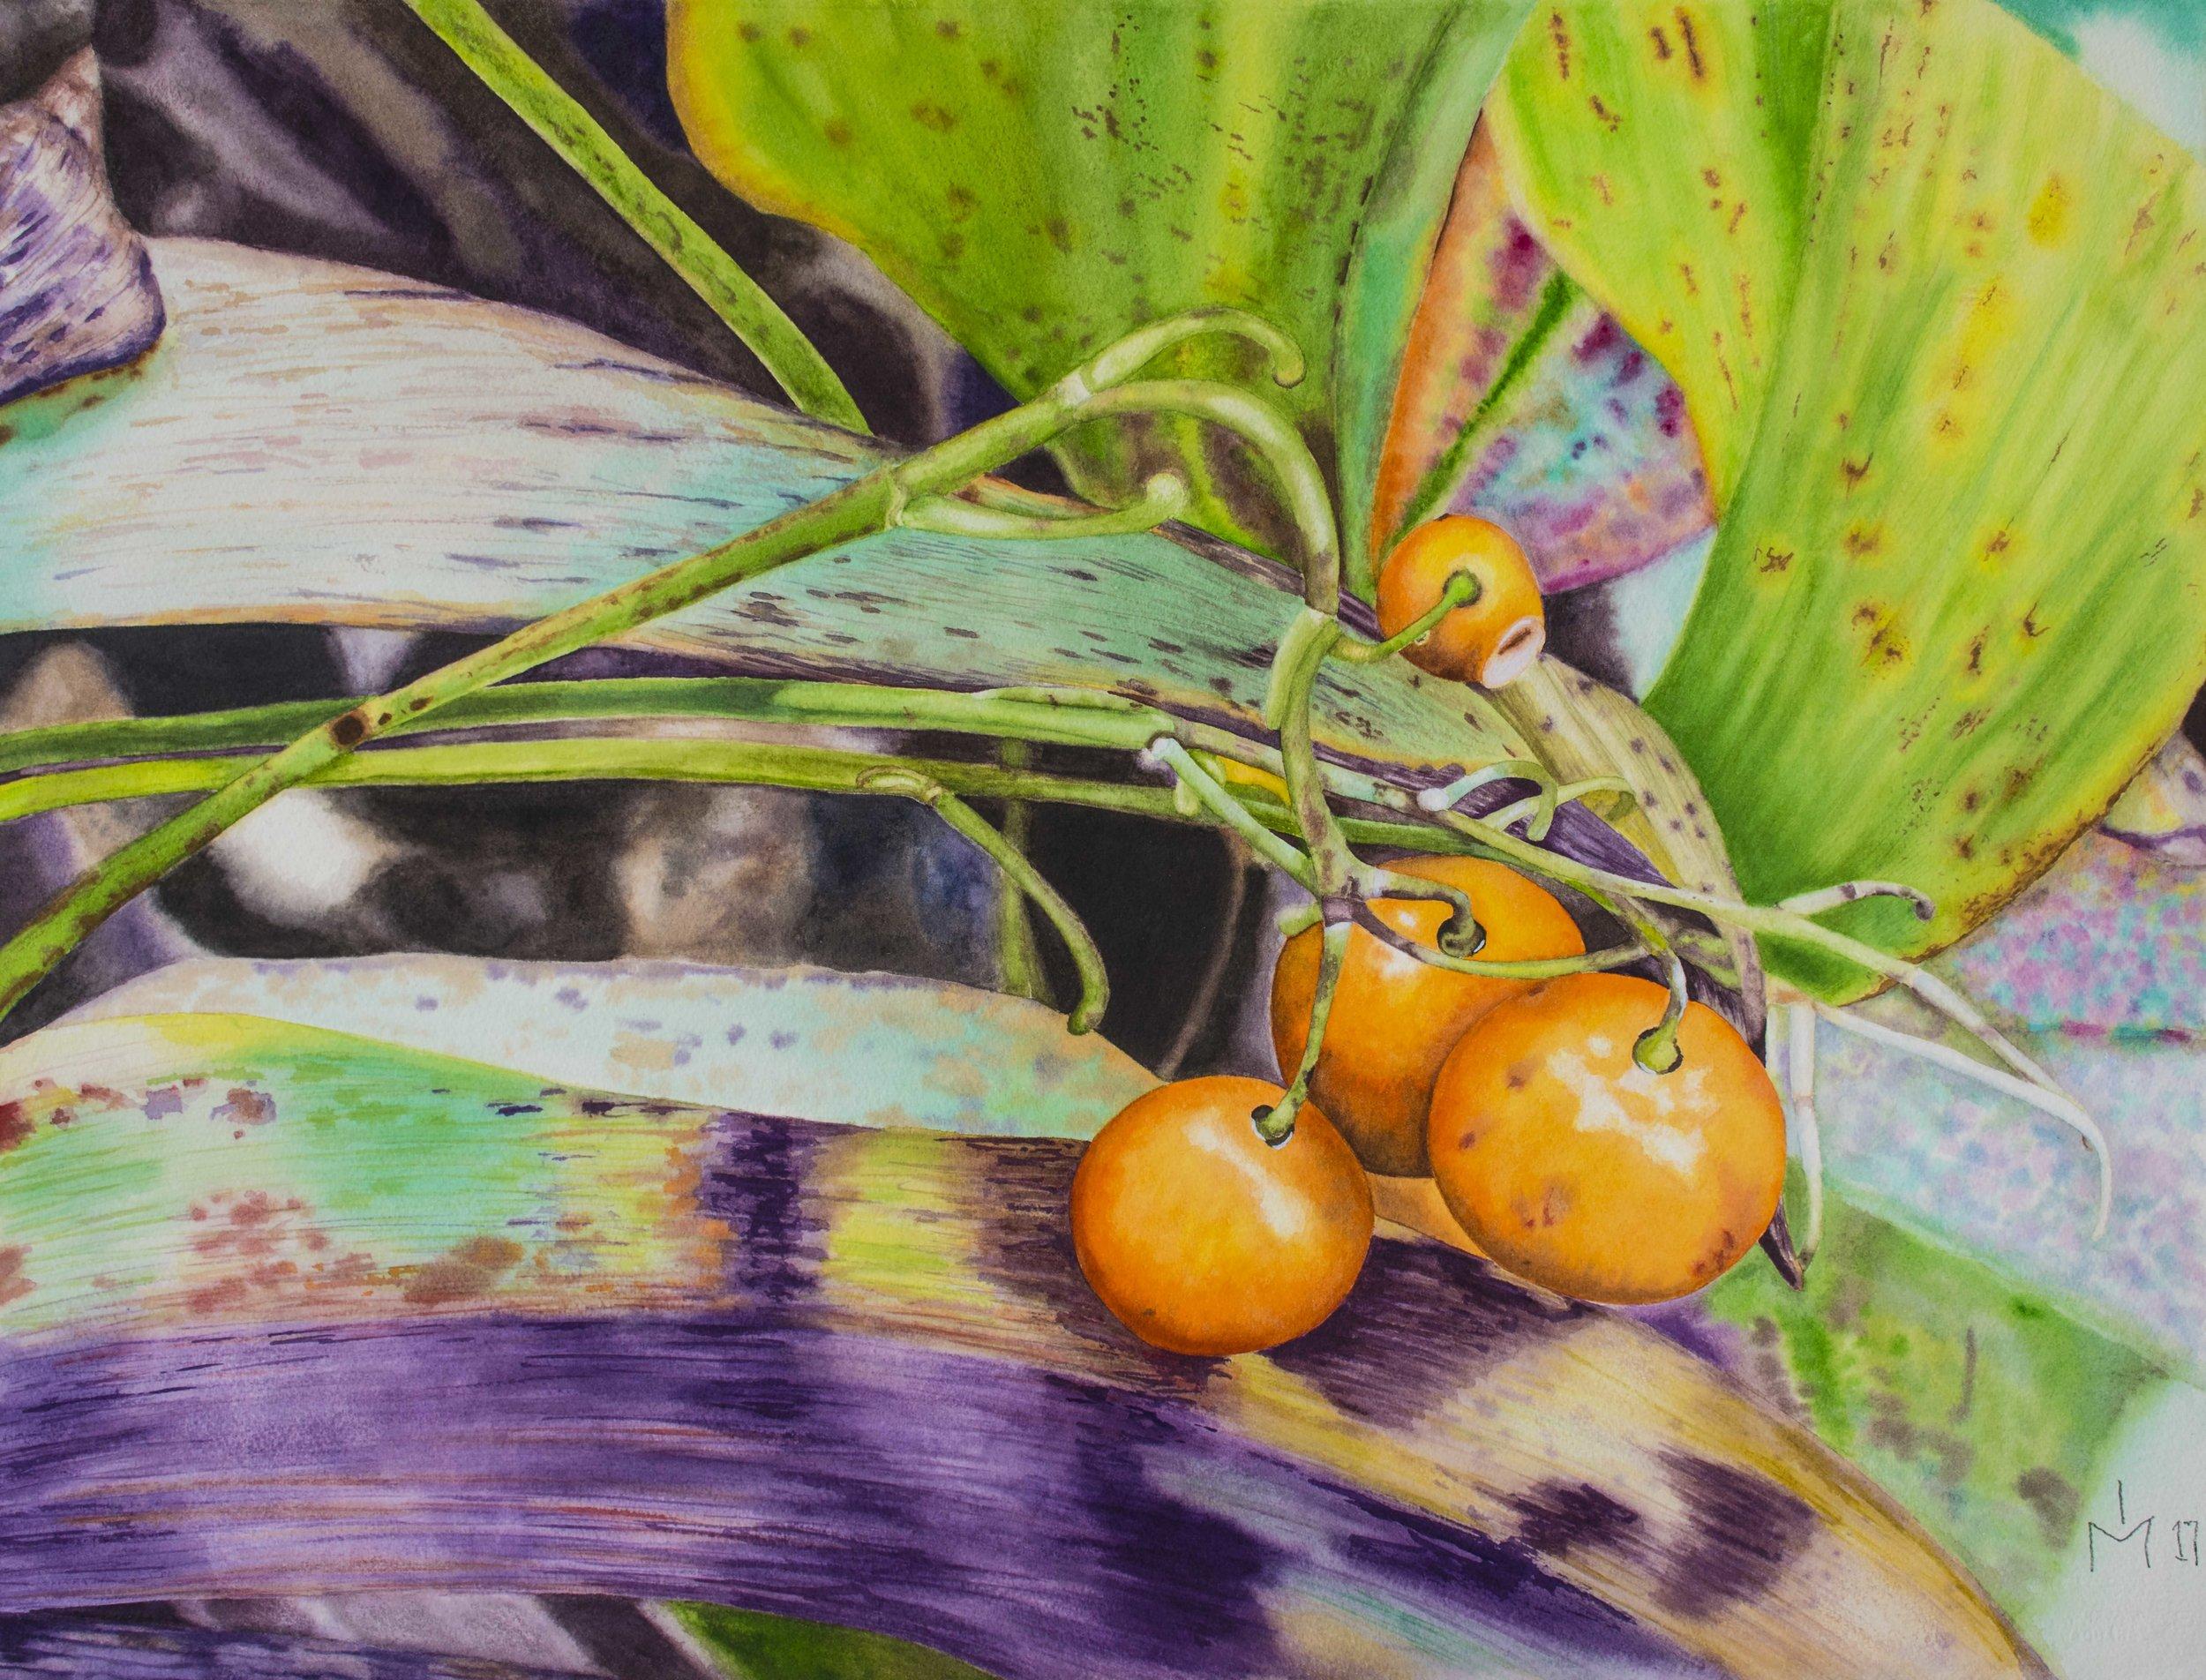 Eduvigis (Inma) Medina, Lily of the vally berries, Watercolor on paper, W73 X H57,  http://www.inmamedina.com